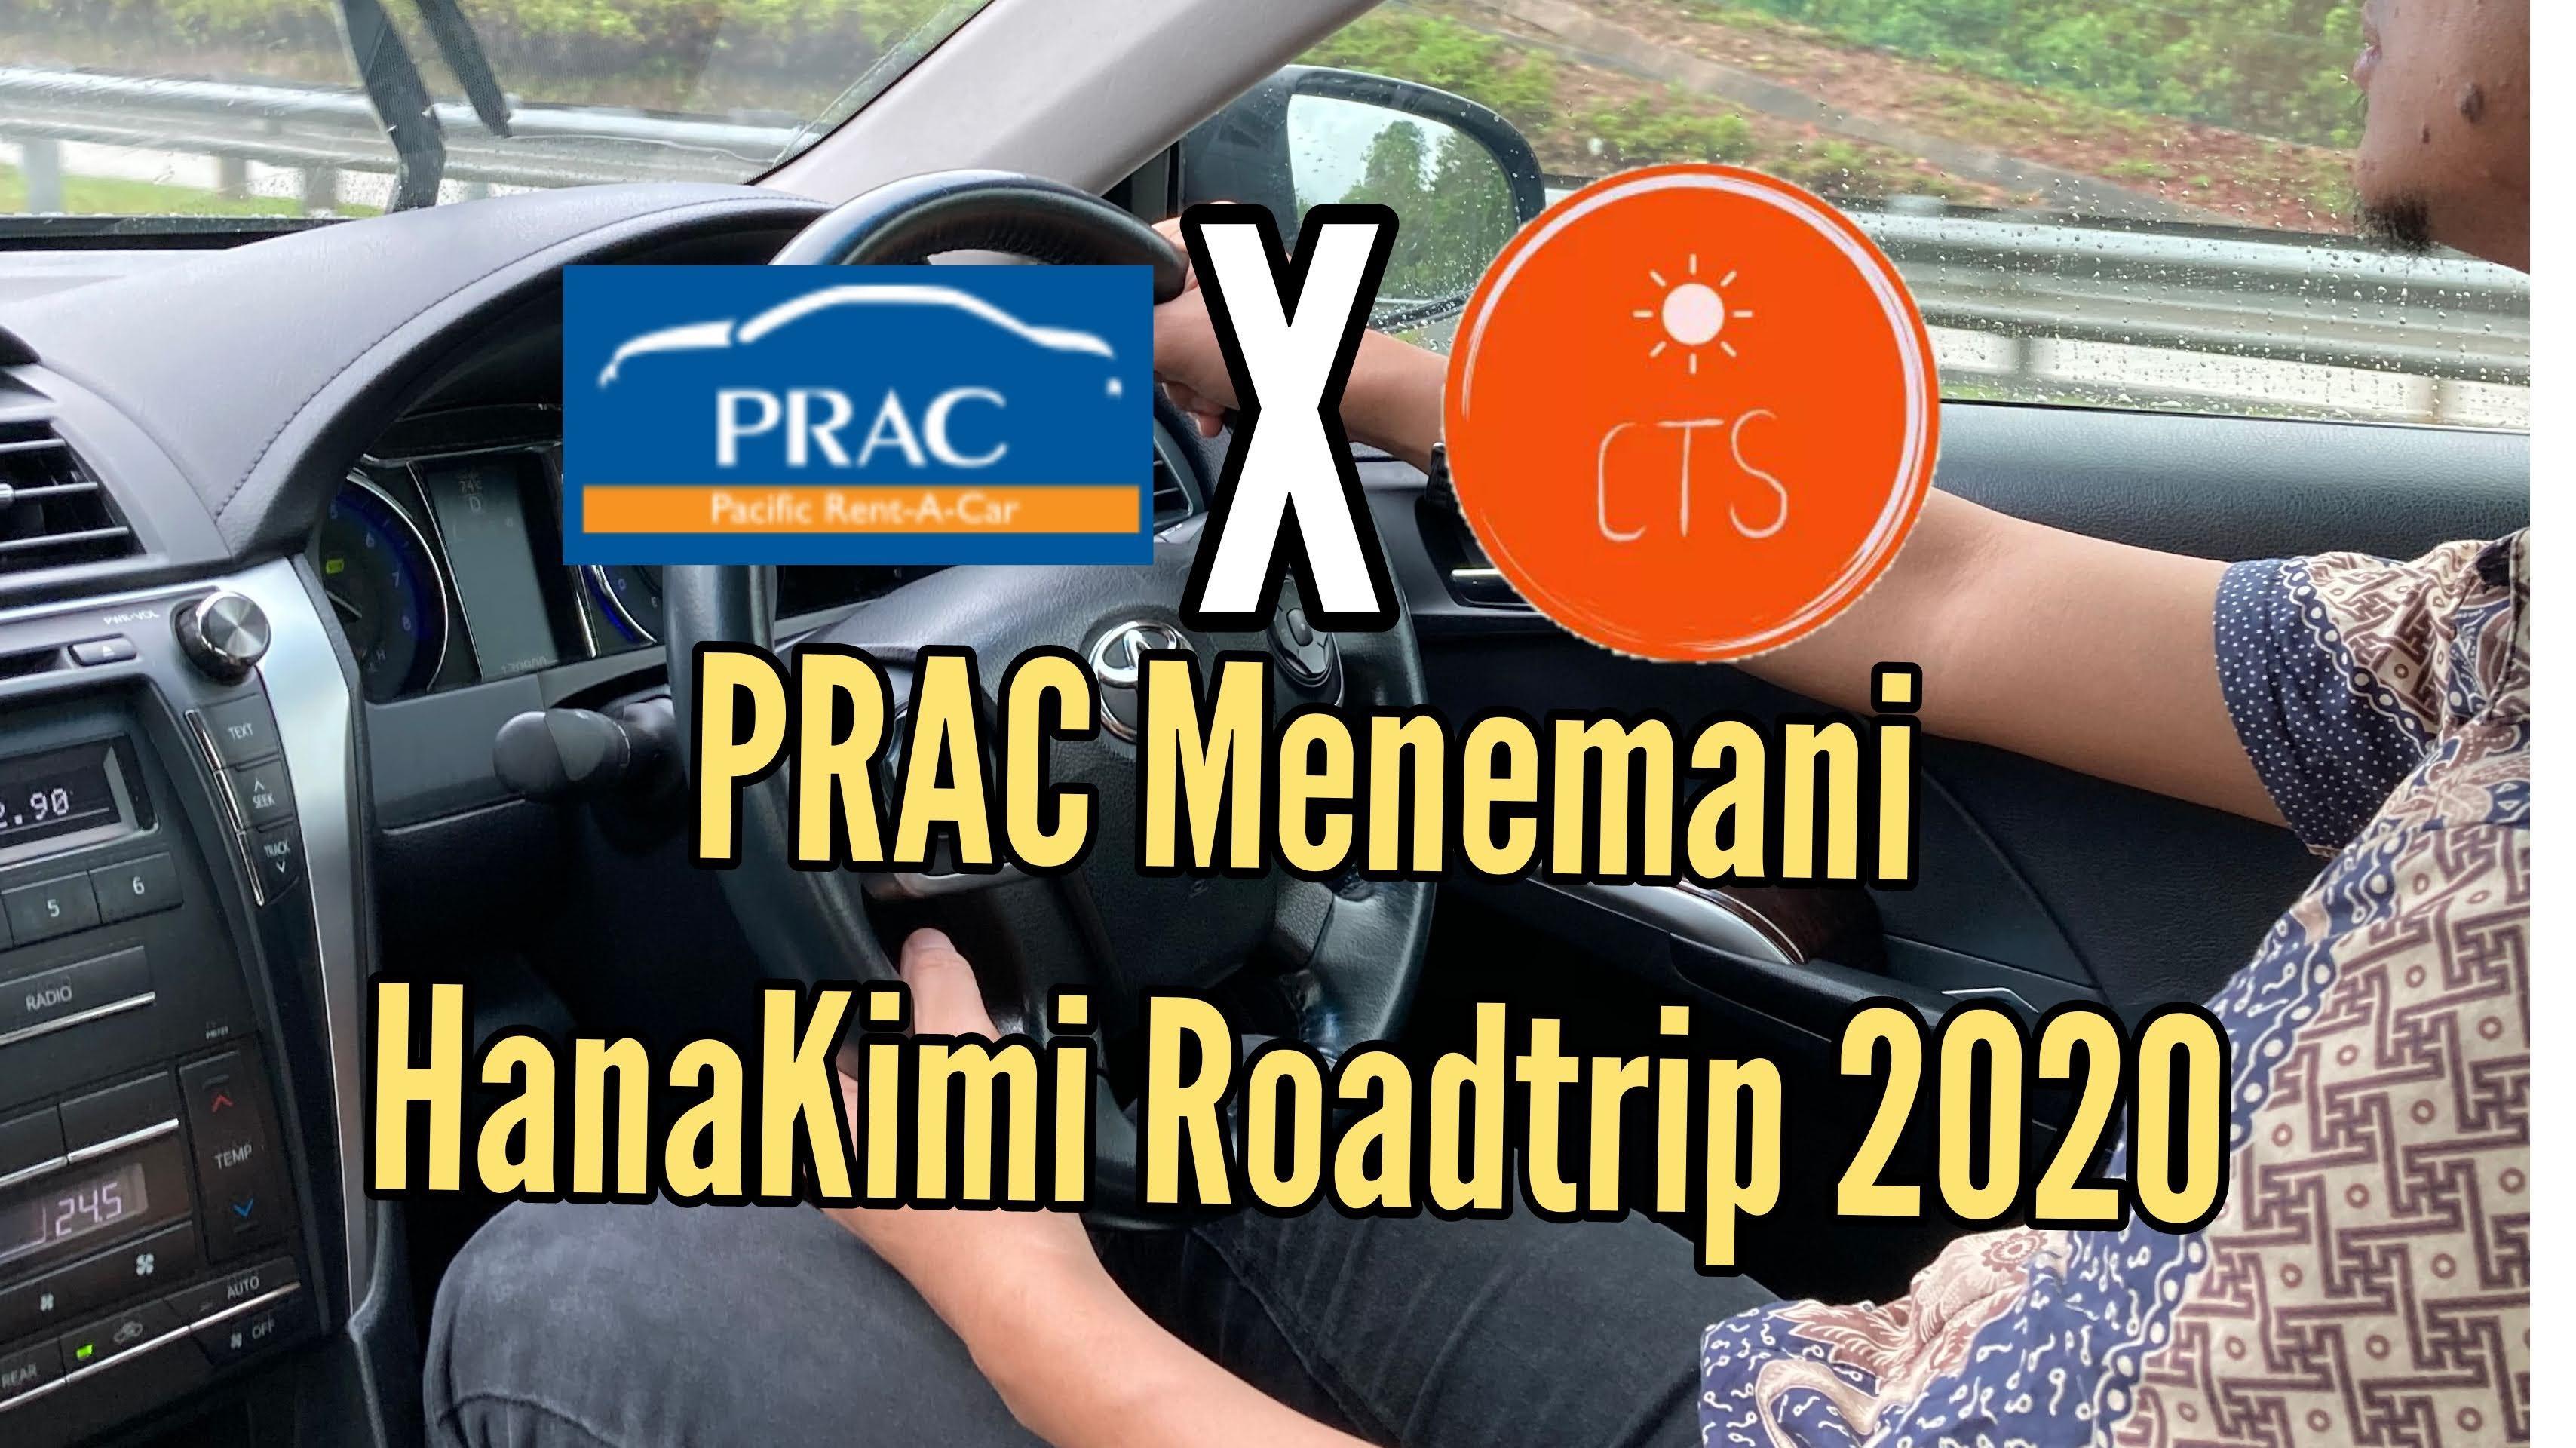 PRAC Menemani HanaKimi Anniversary Roadtrip 2020!